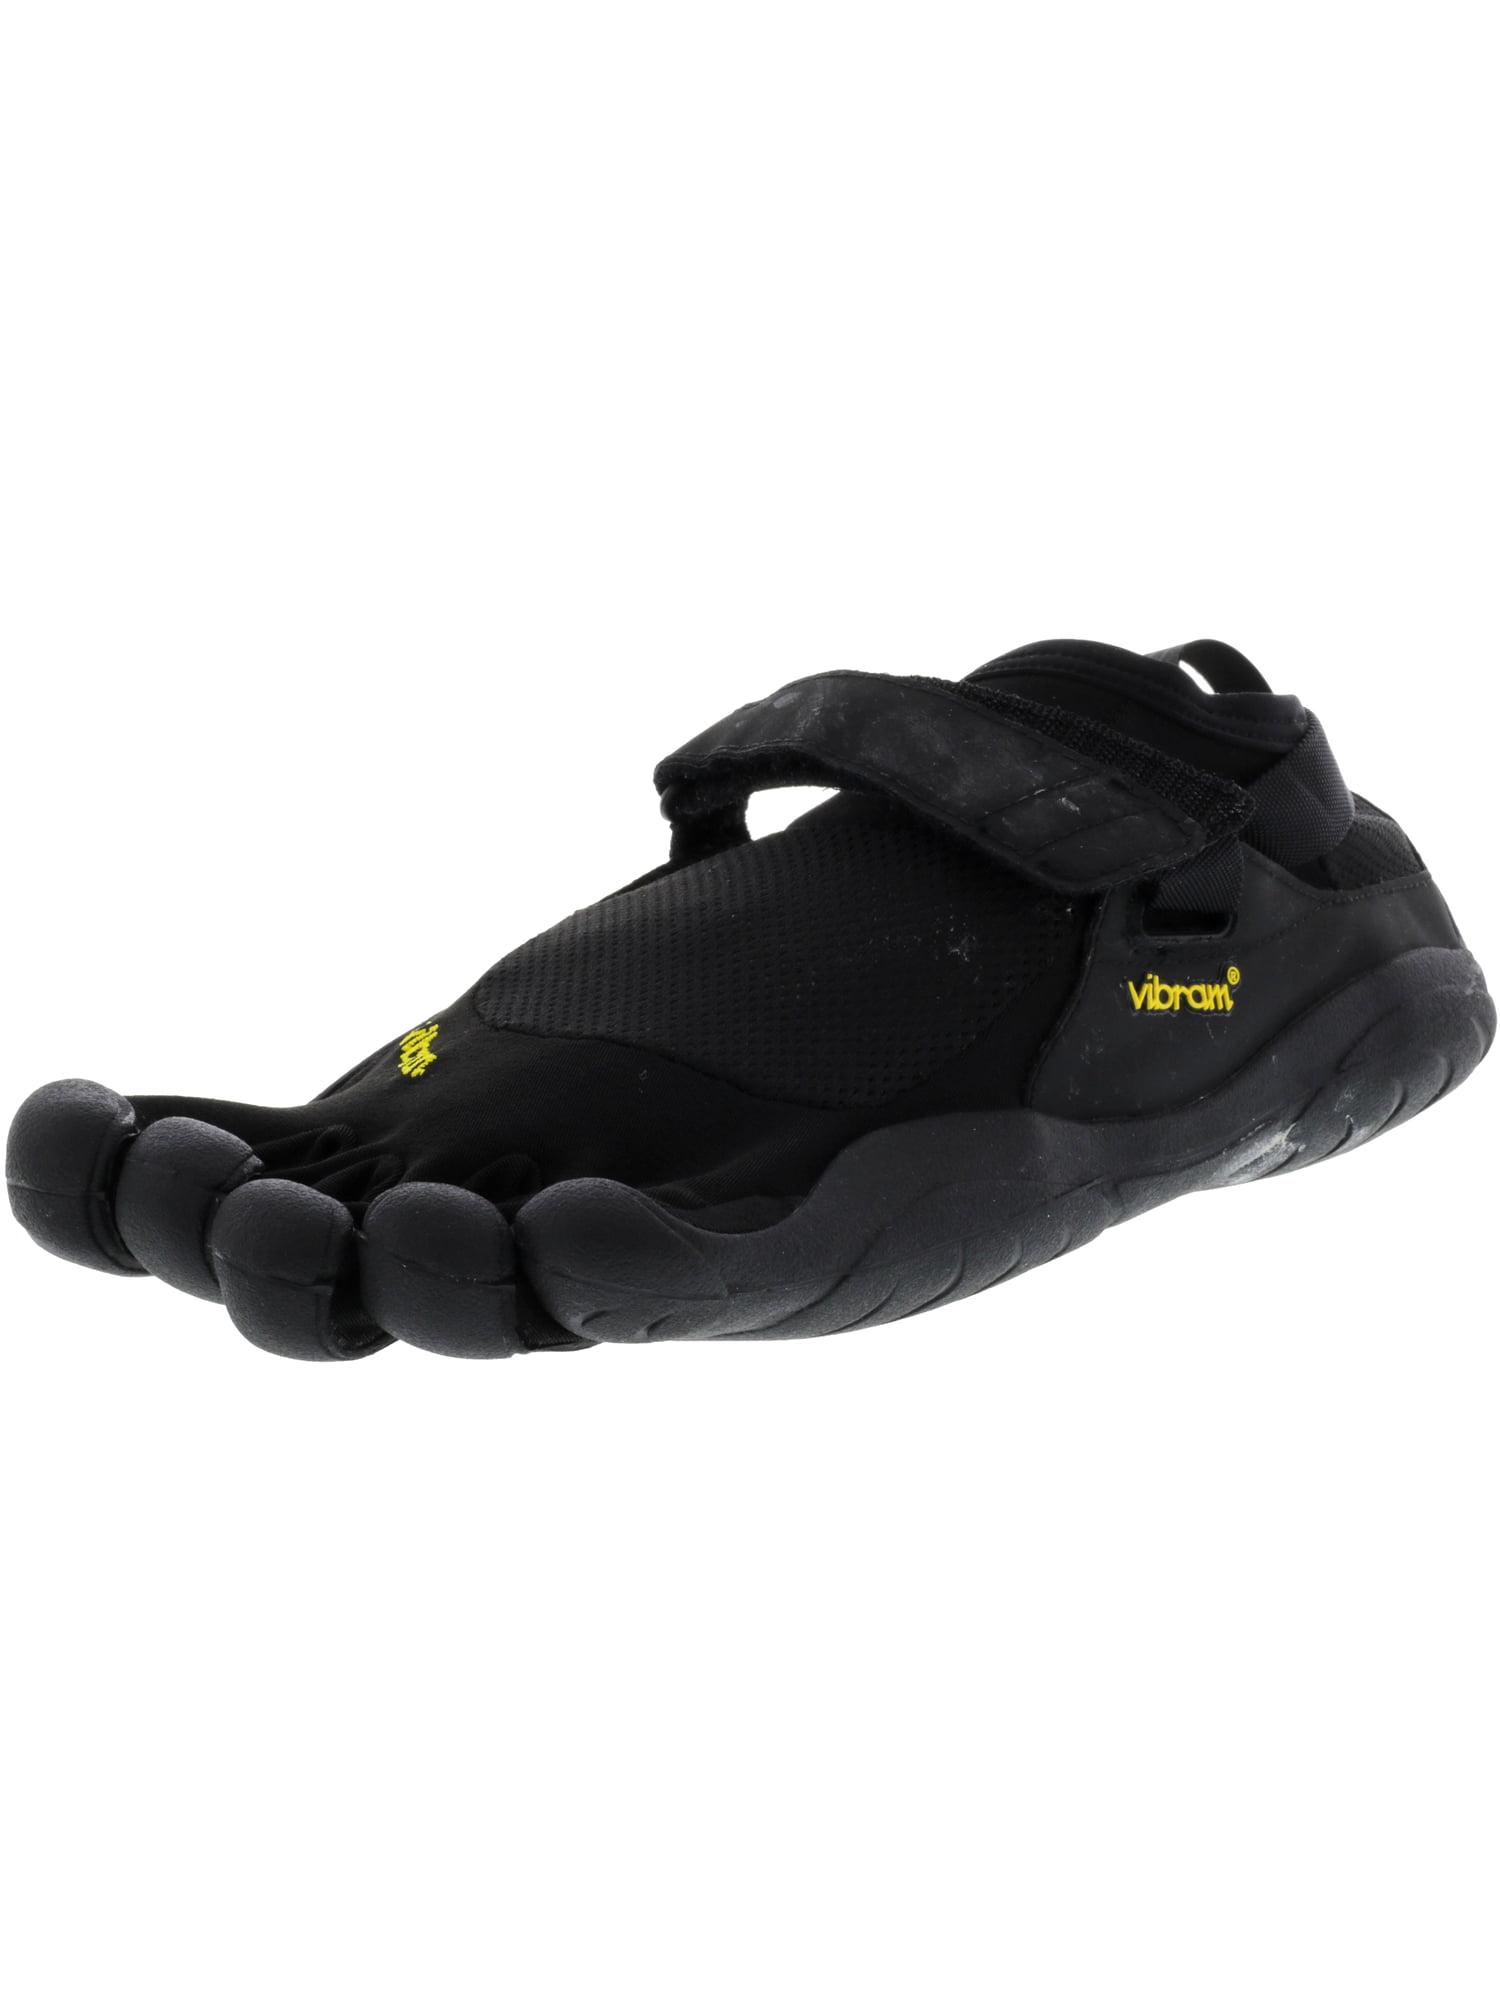 Vibram Five Fingers Men's Kso Black Ankle-High Training Shoes - 9.5M